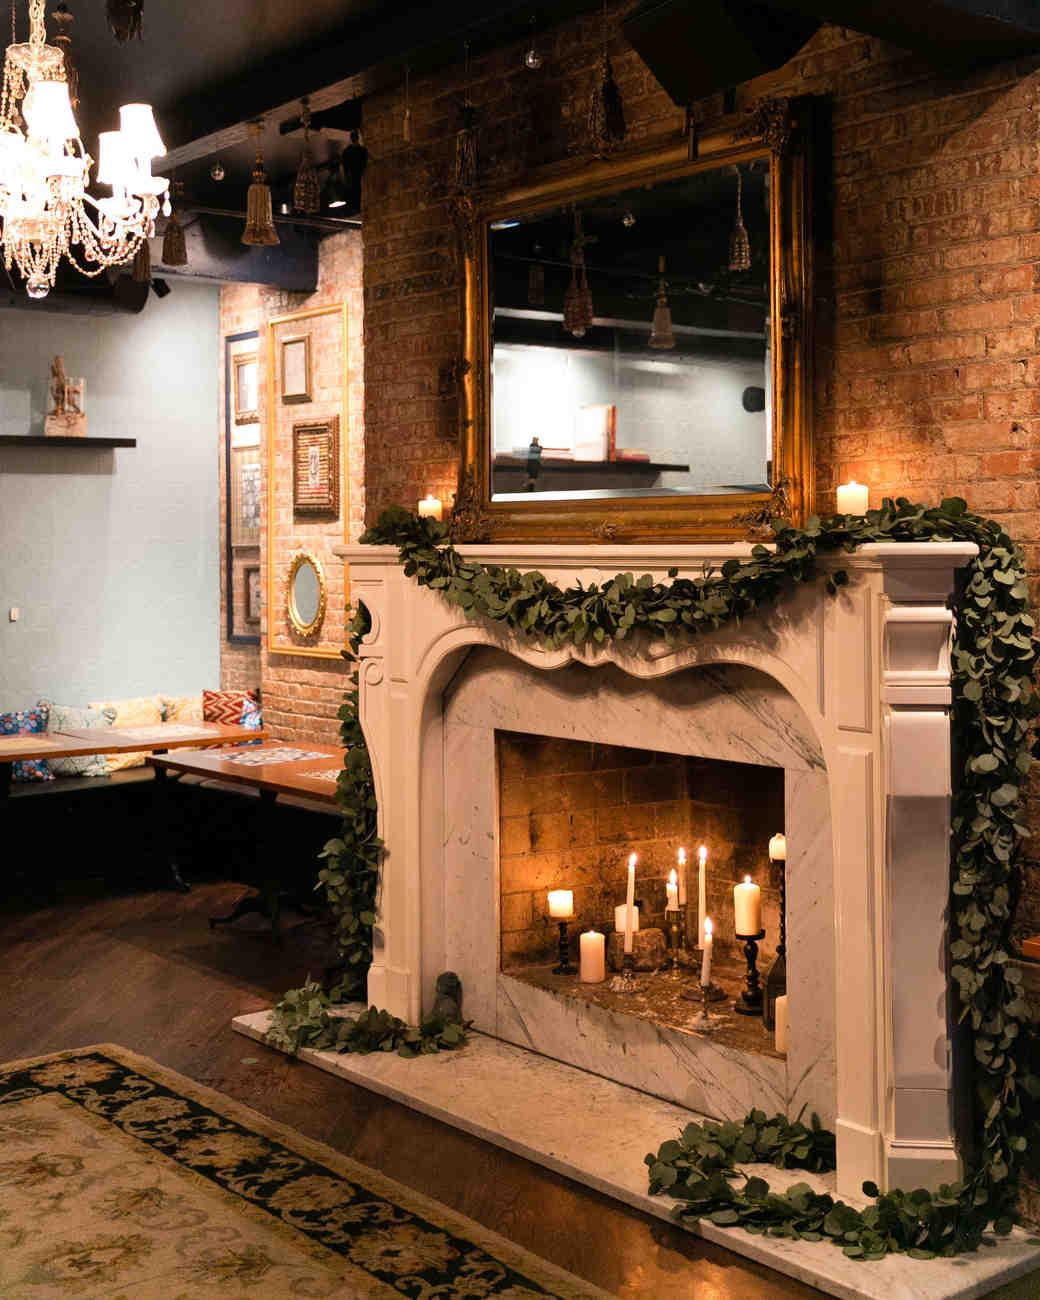 bianca-bryen-wedding-fireplace-190-s112509-0216.jpg